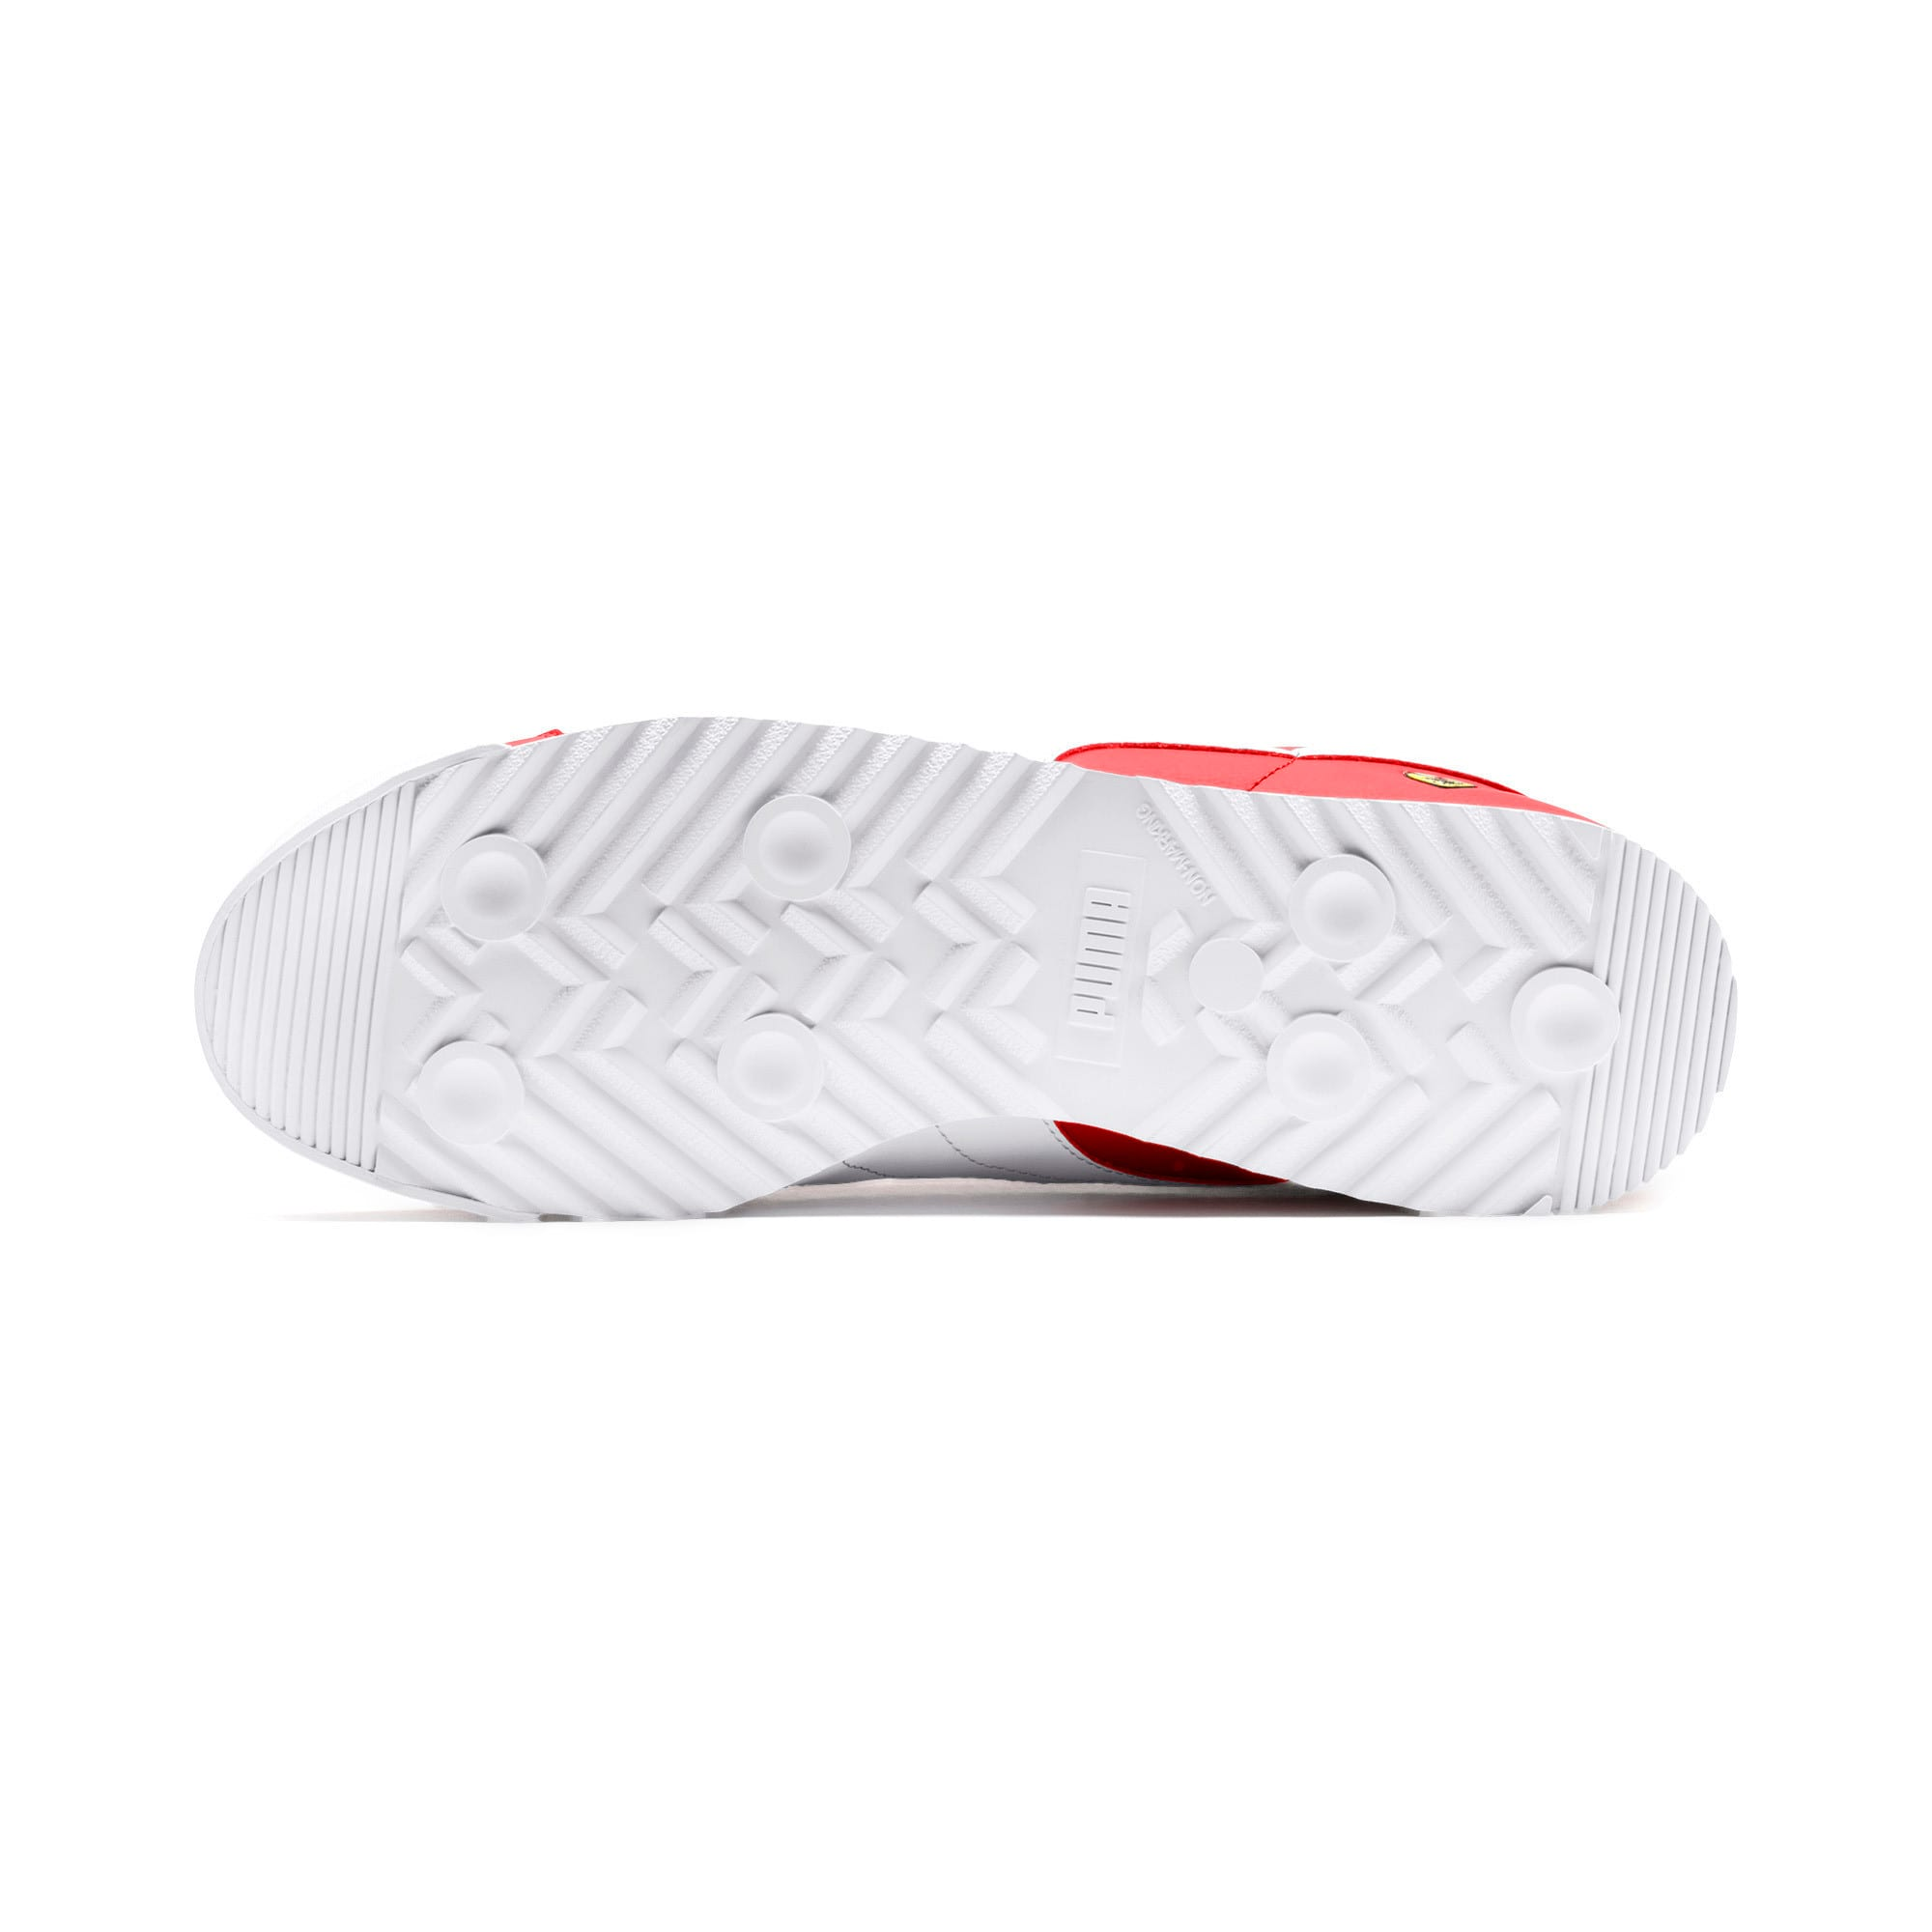 Miniatura 5 de Zapatos deportivos Scuderia Ferrari Roma para hombre, Rosso Corsa-White-Black, mediano